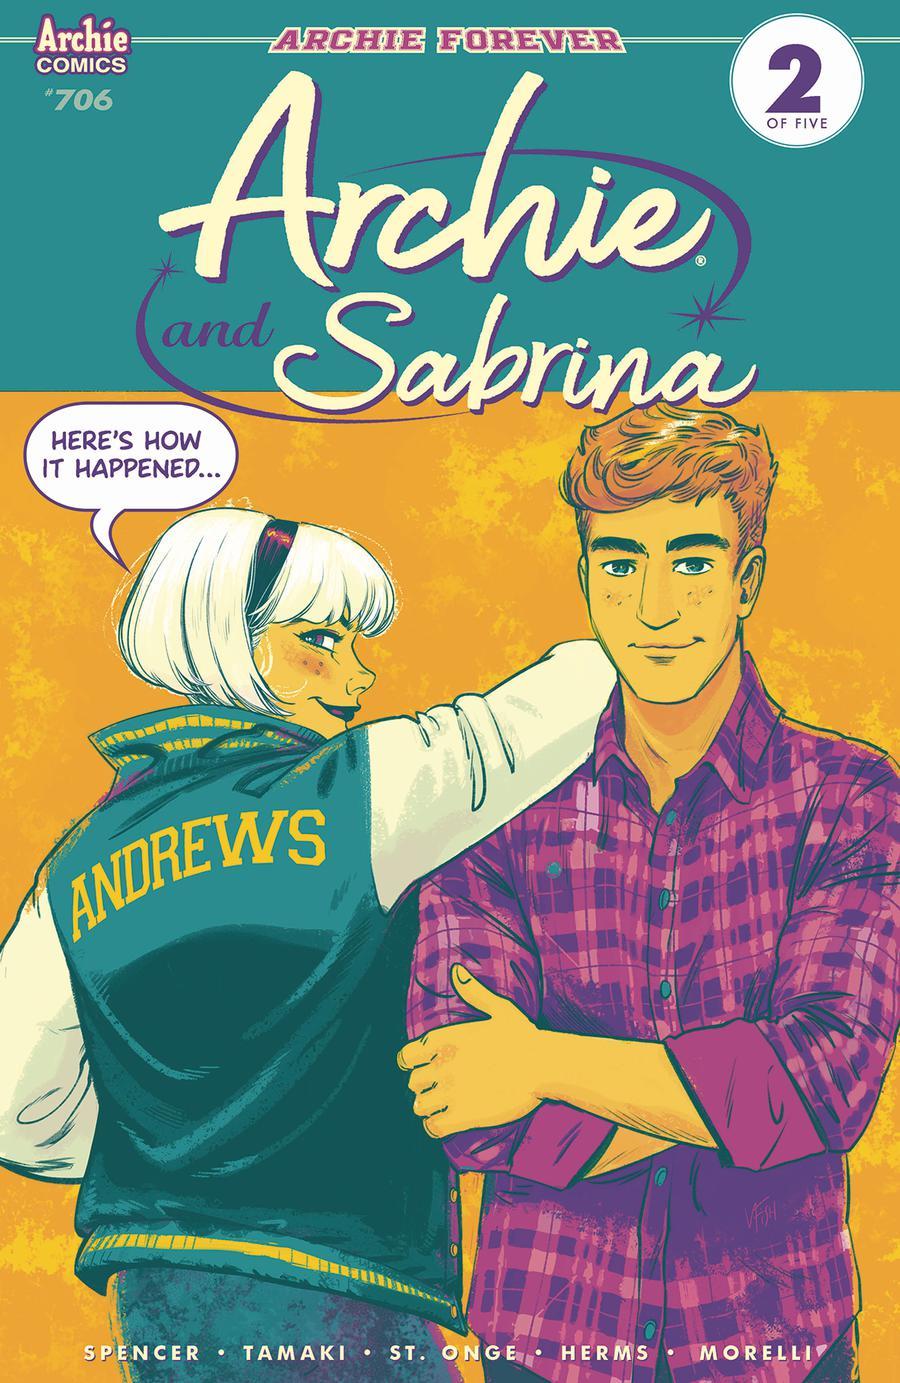 Archie Vol 2 #706 Cover A Regular Veronica Fish Cover